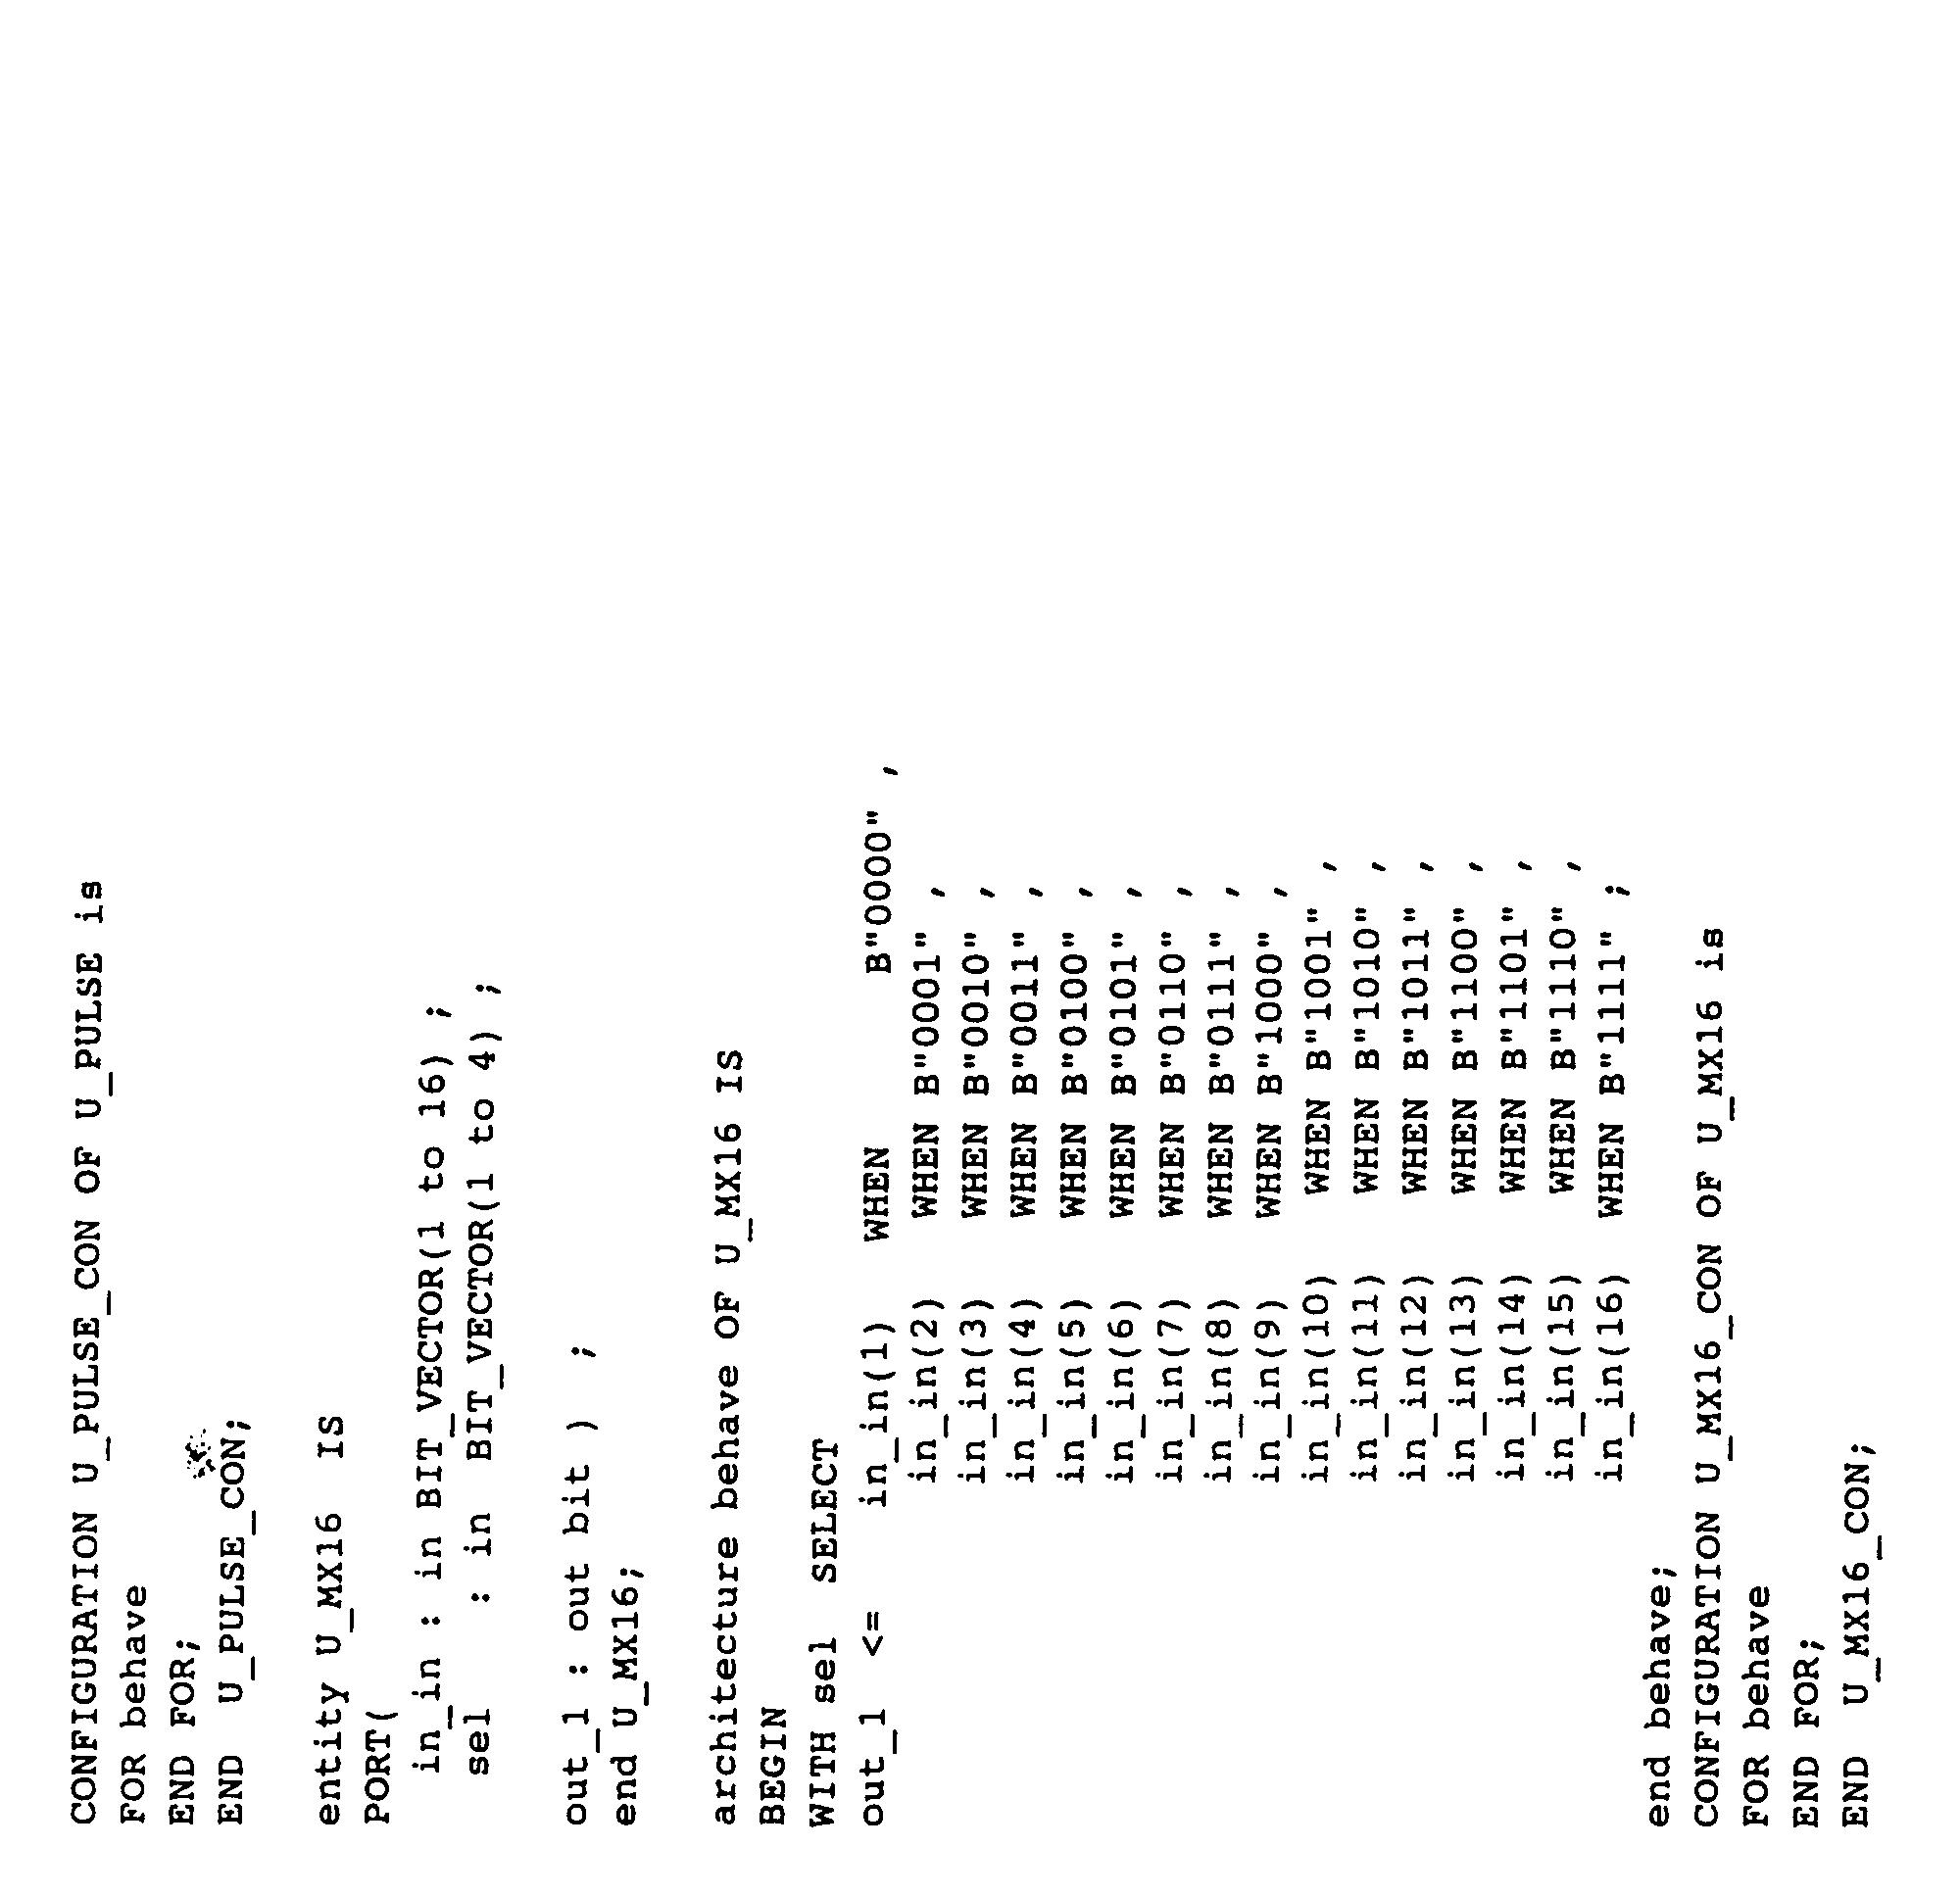 Figure imgb0182